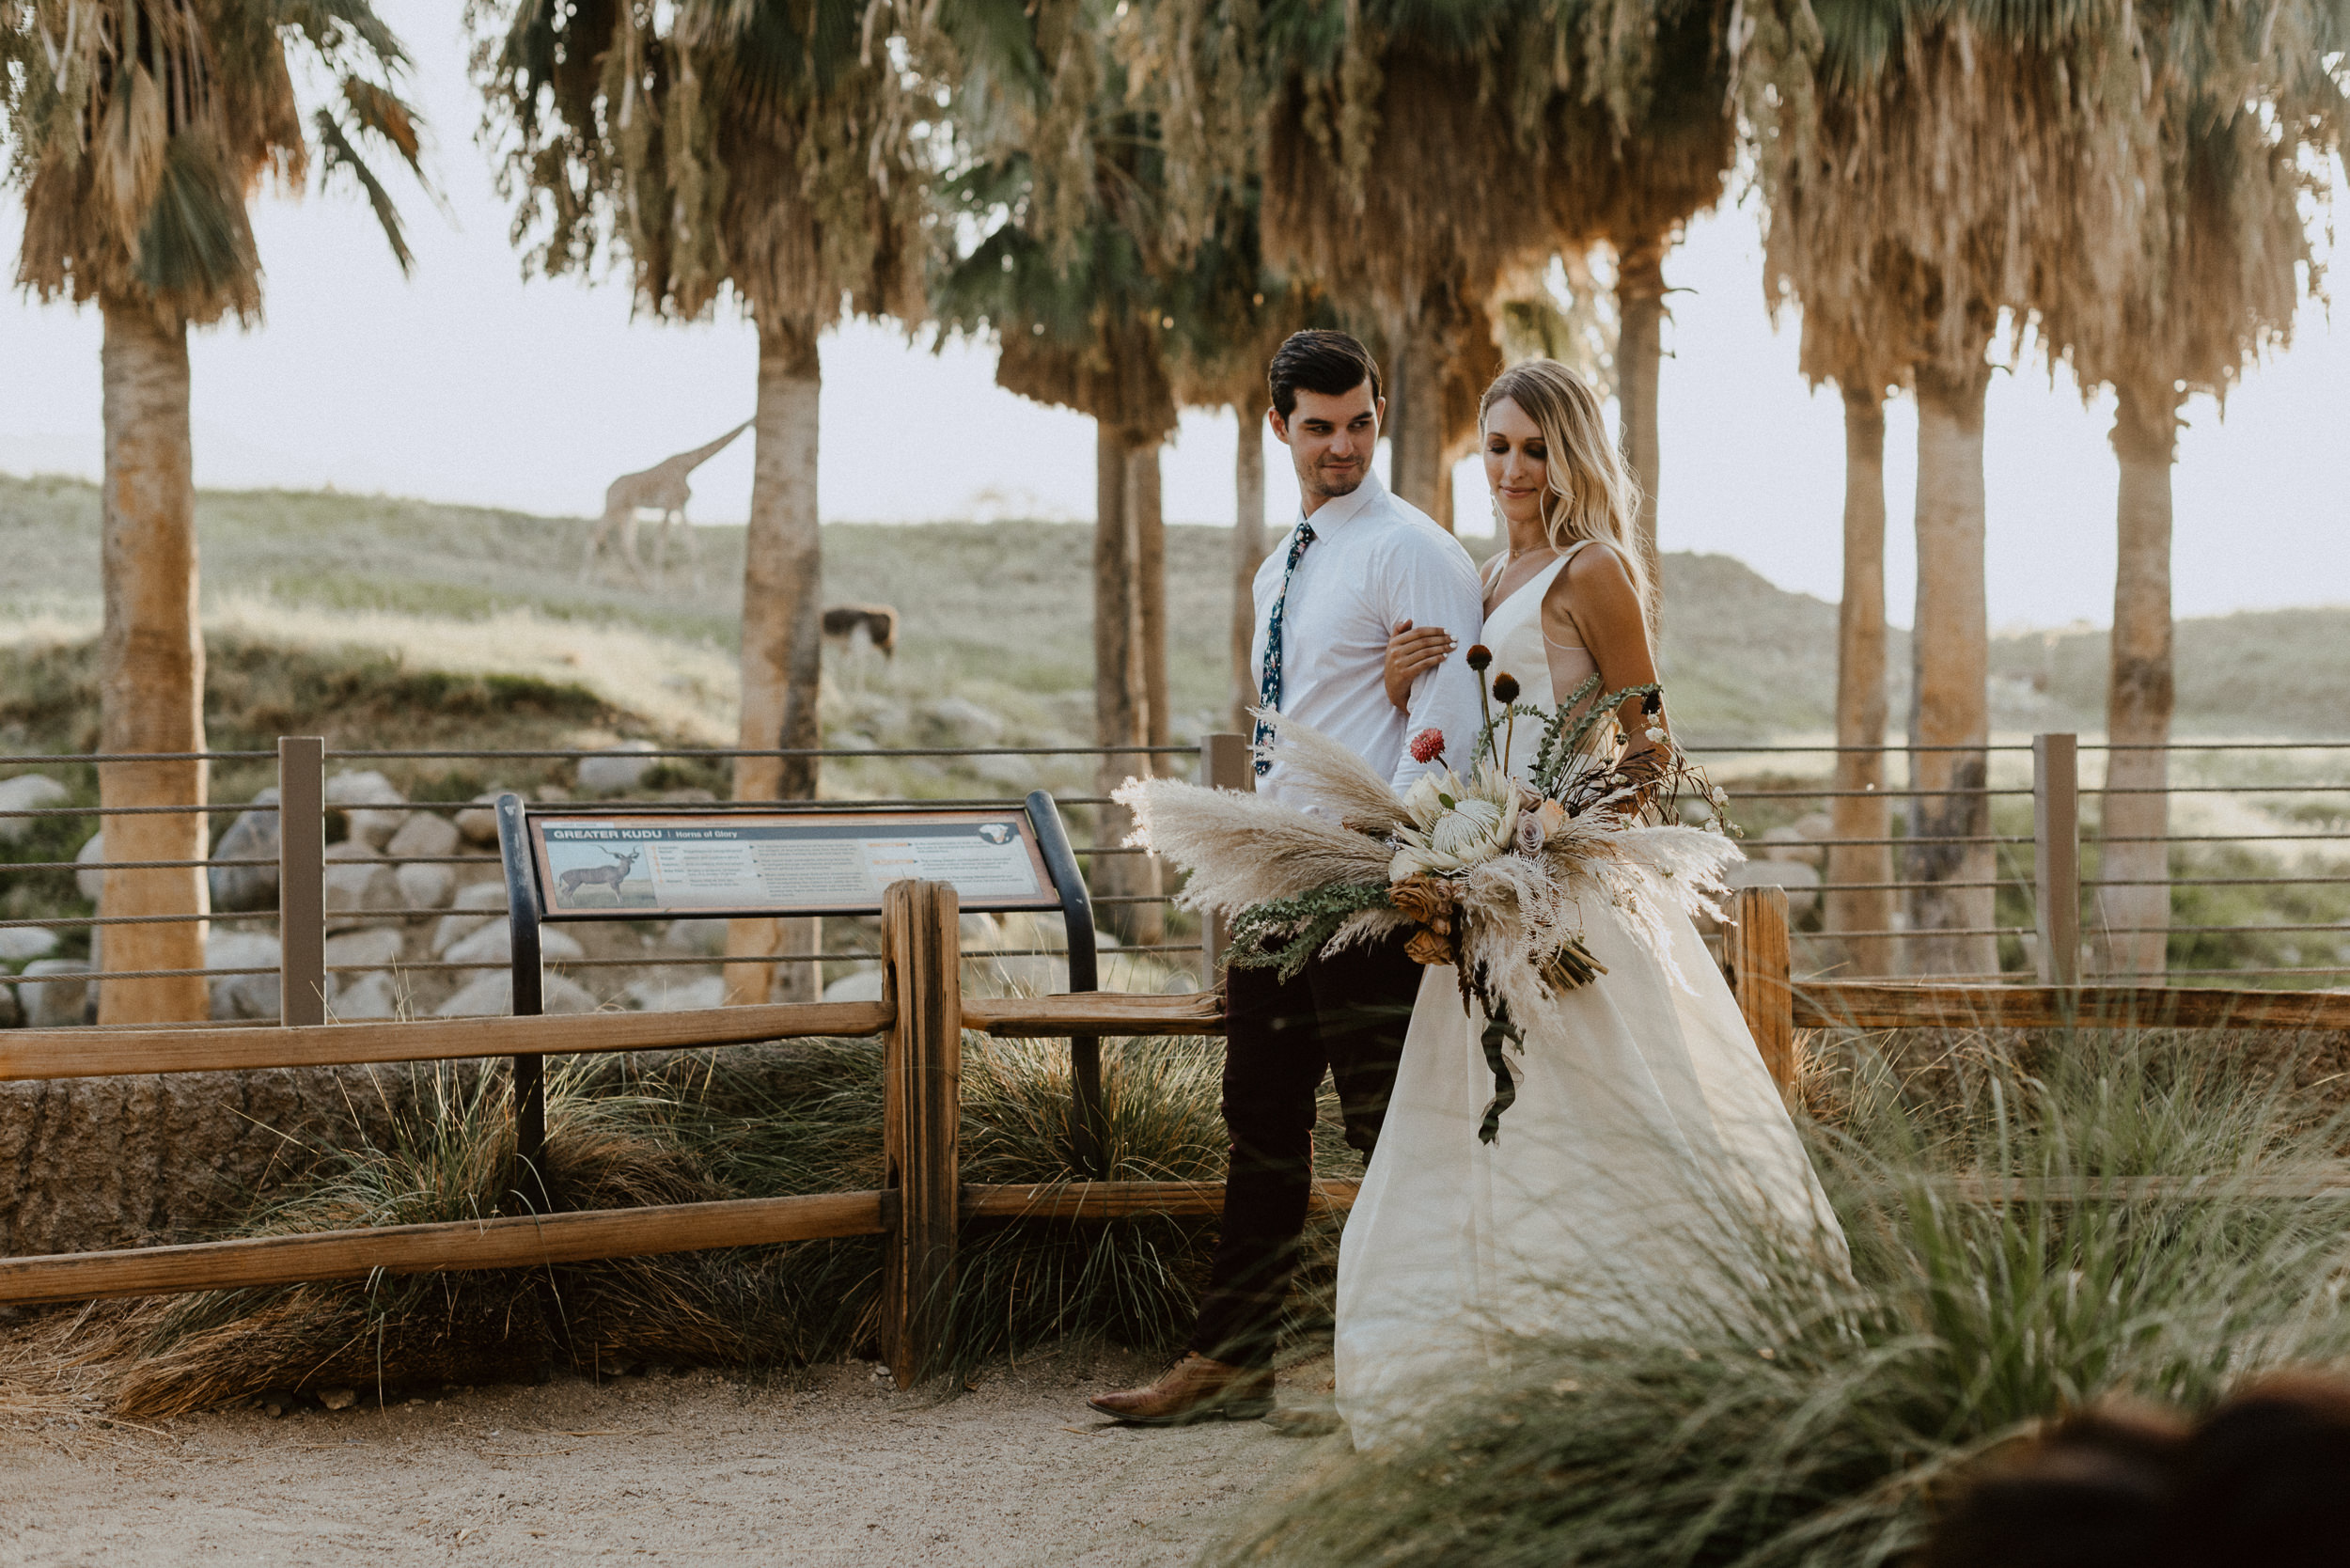 sChelsie + Chris - The Desert Shootout Wedding Romantics at The Living Desert-126.jpg